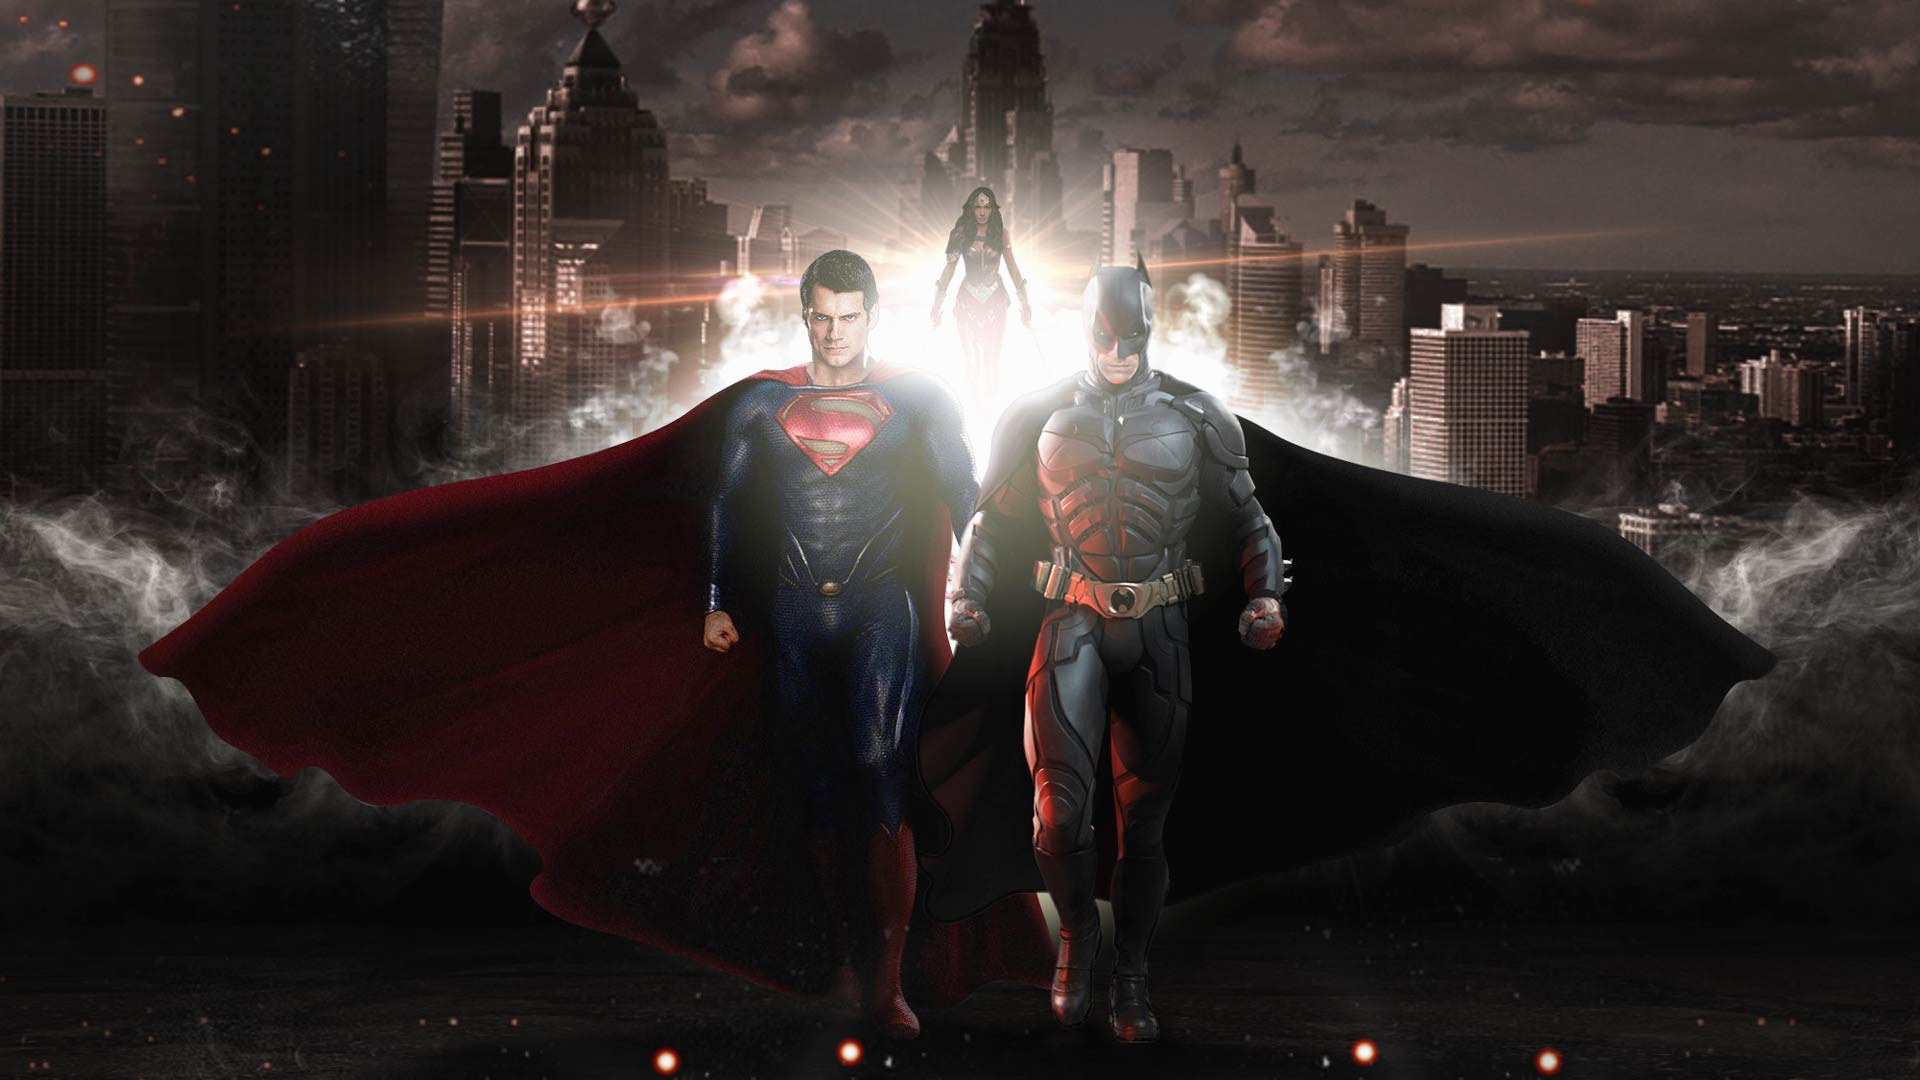 Batman Vs Superman 2016 Movie Wallpaper Hd 1080p Desktop - HD Wallpaper